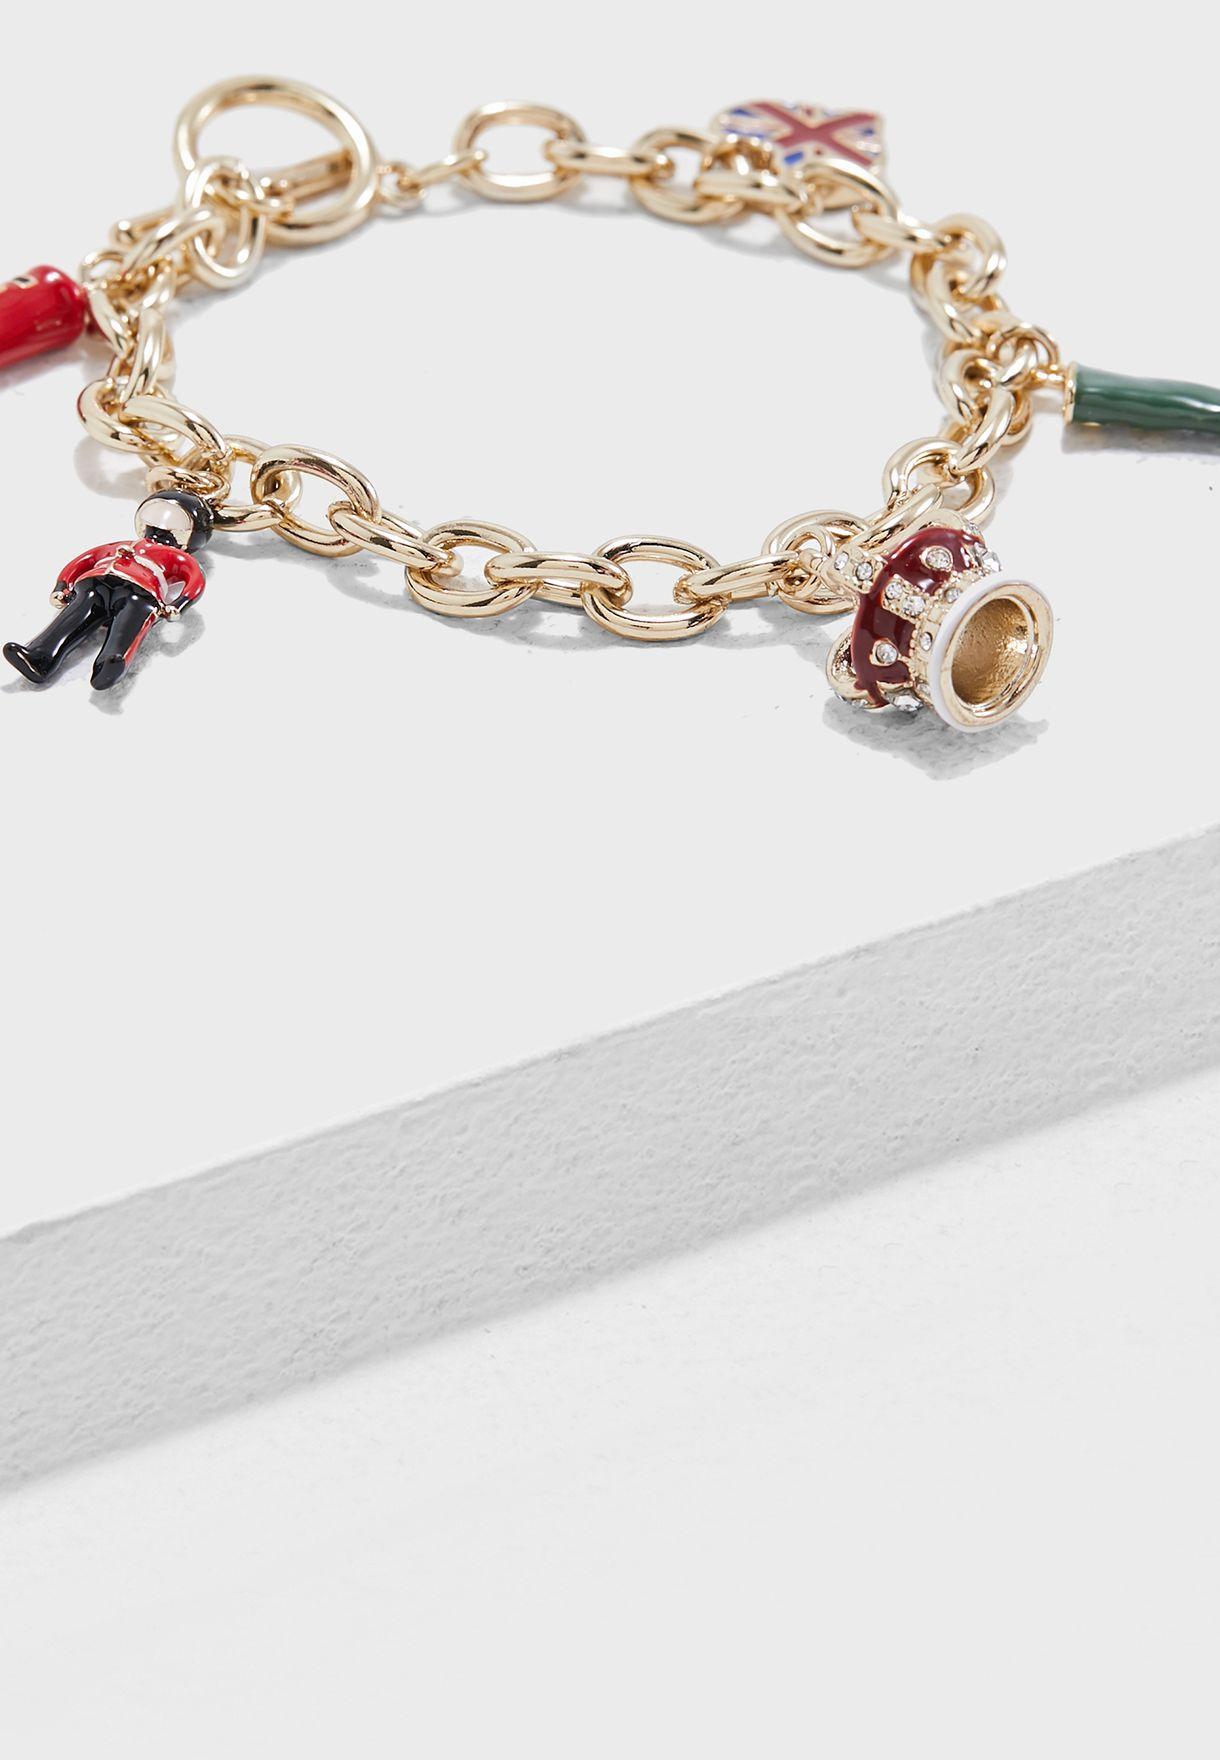 London Charm Bracelet